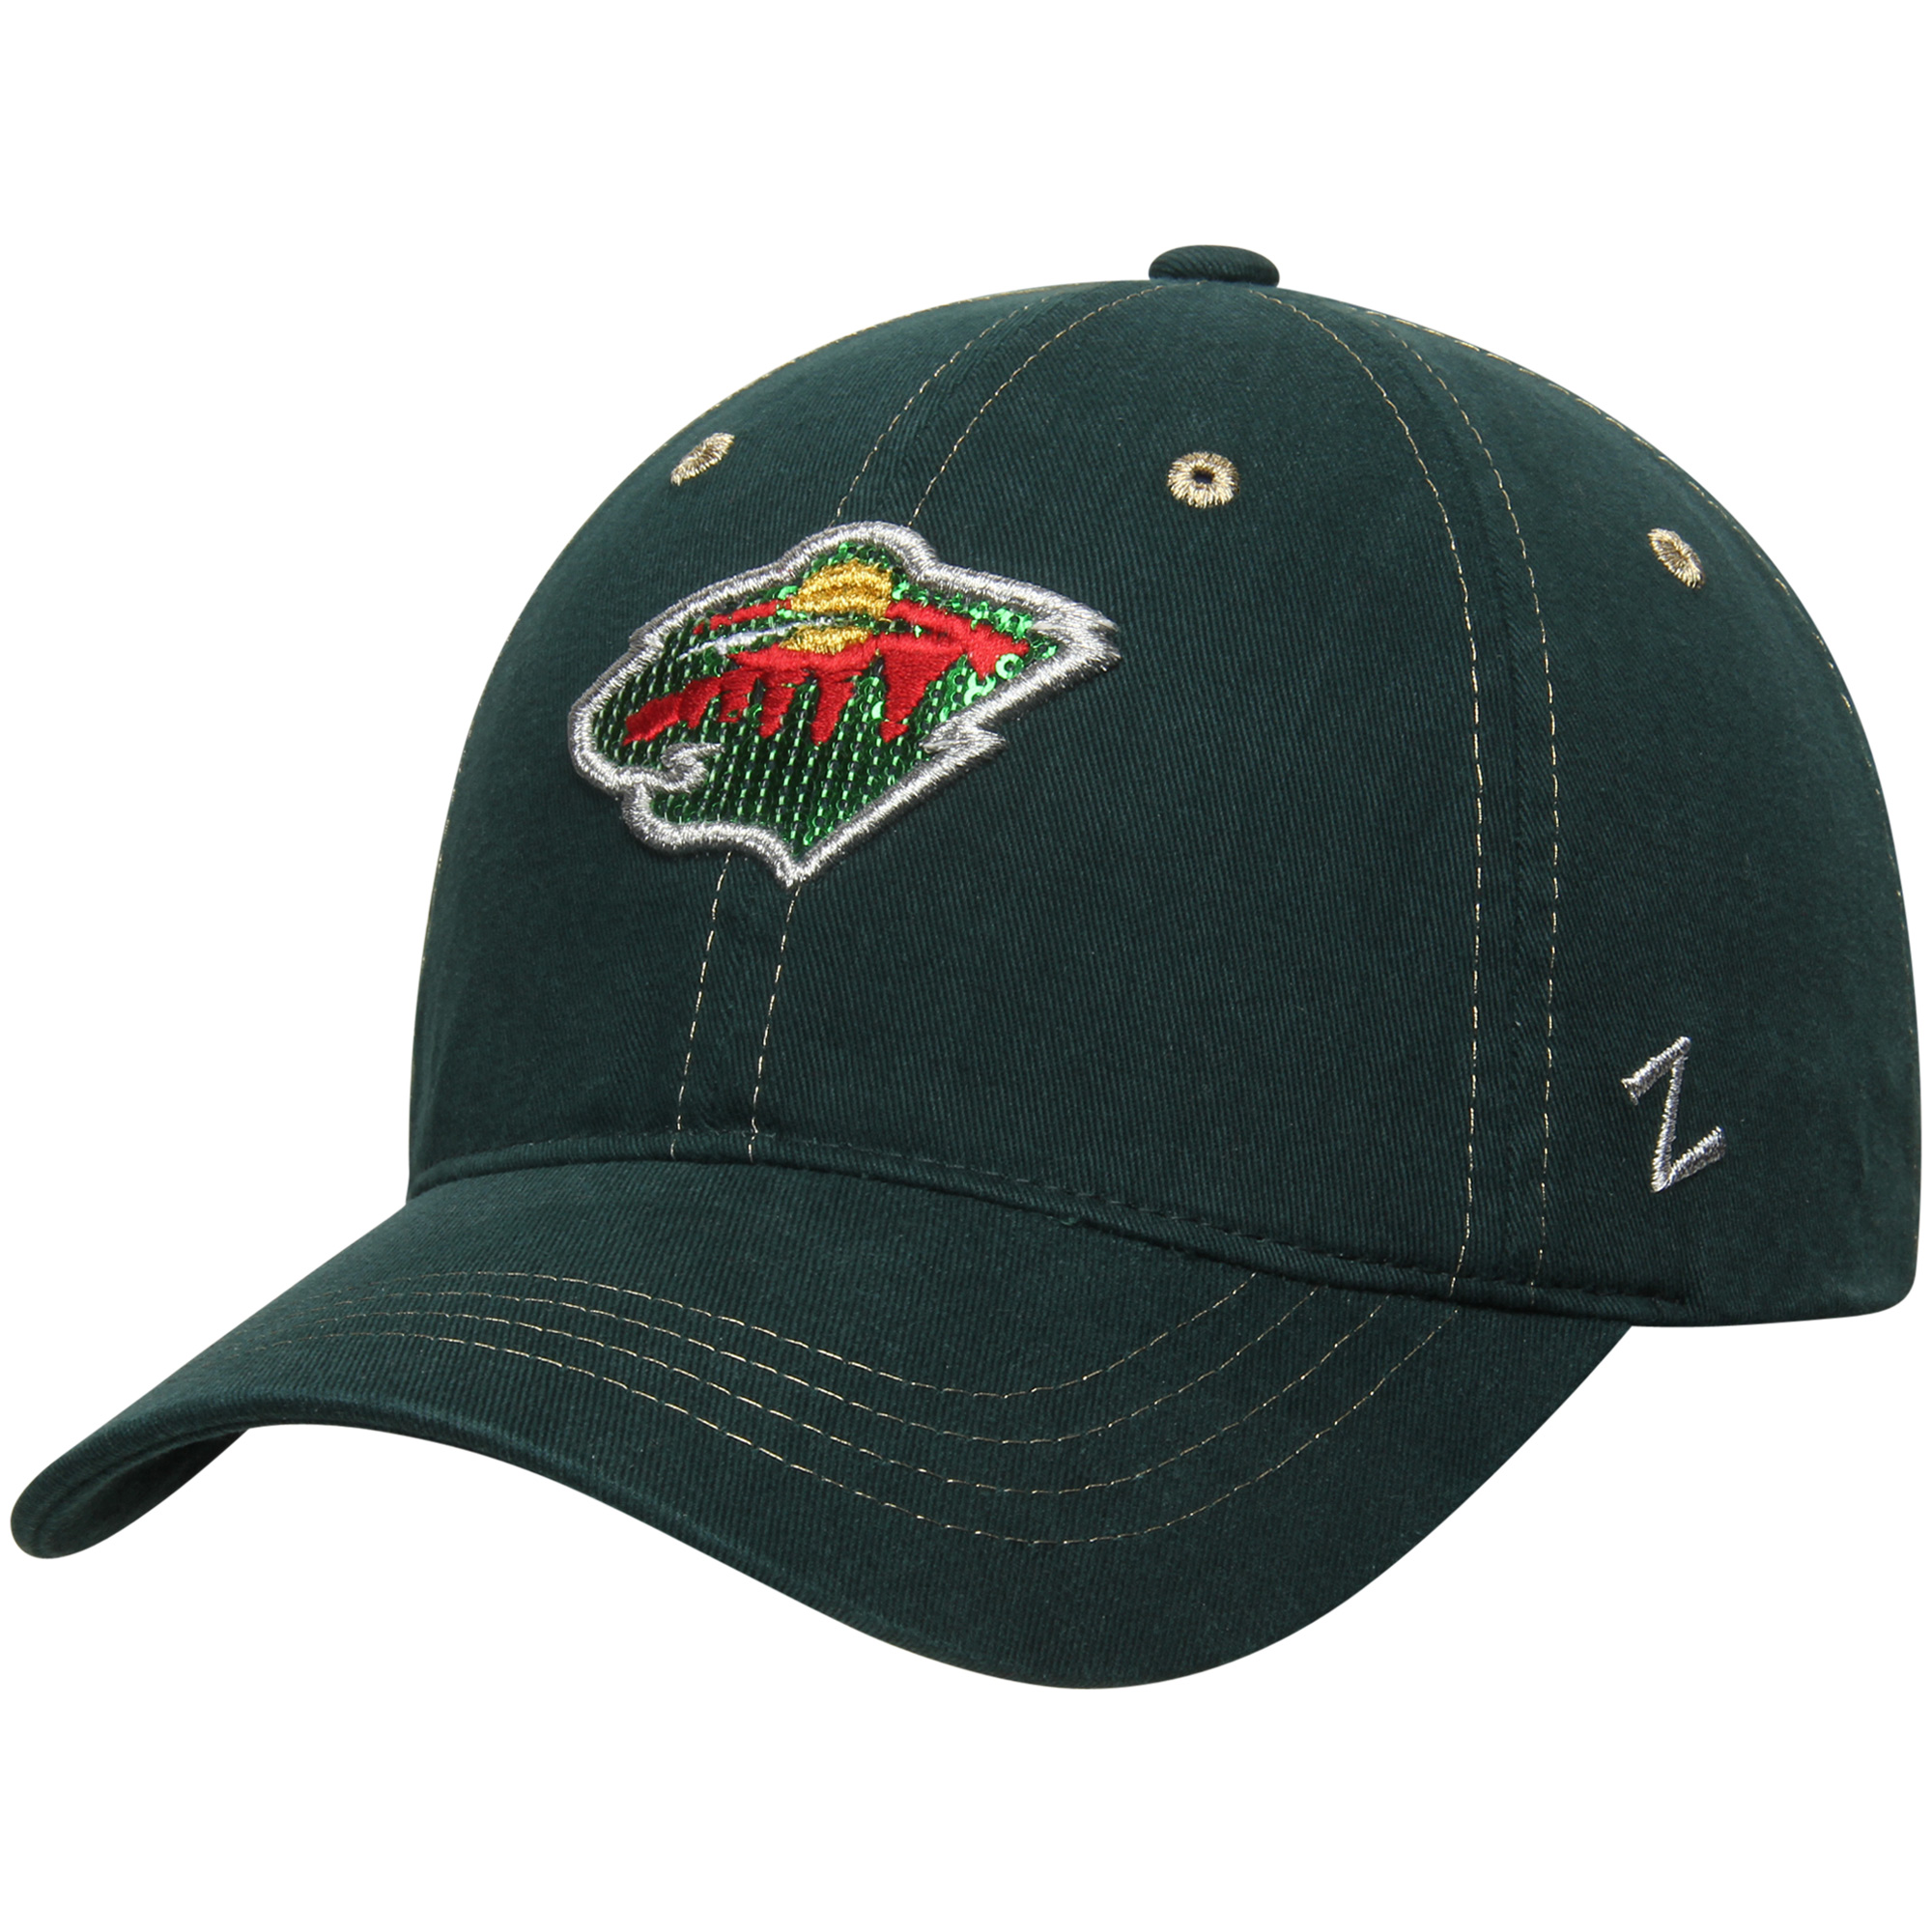 Minnesota Wild Zephyr Women's Relish Adjustable Hat - Green - OSFA